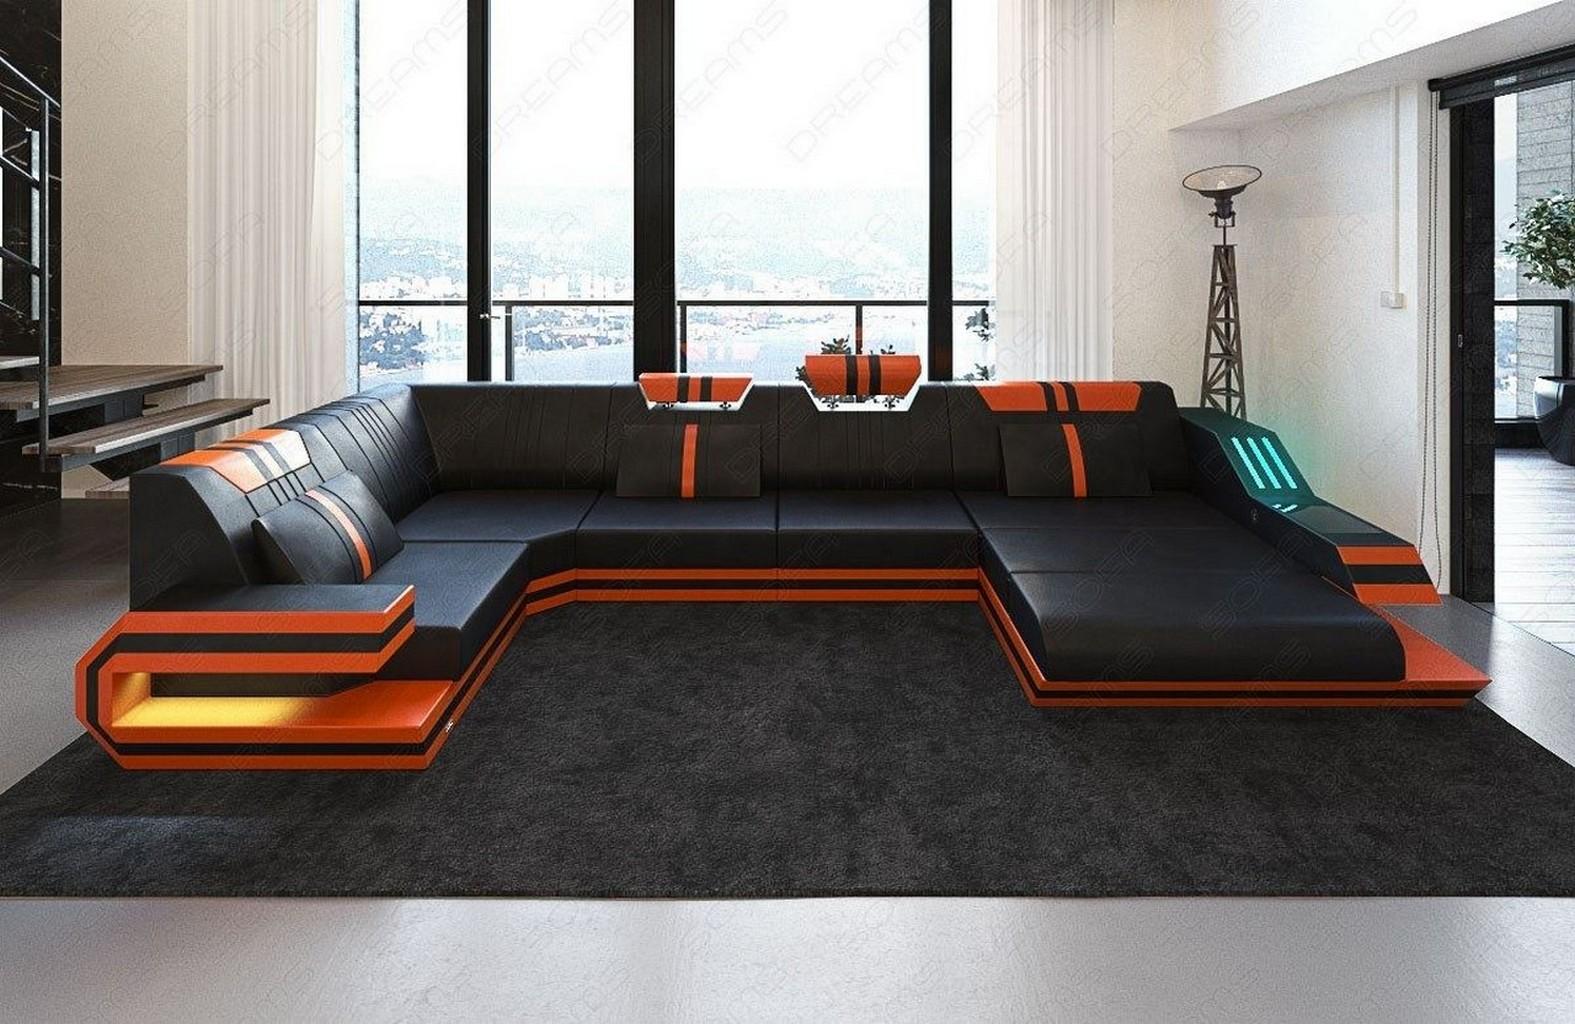 wohnlandschaft ravenna u lerdercouch mit led beleuchtung. Black Bedroom Furniture Sets. Home Design Ideas